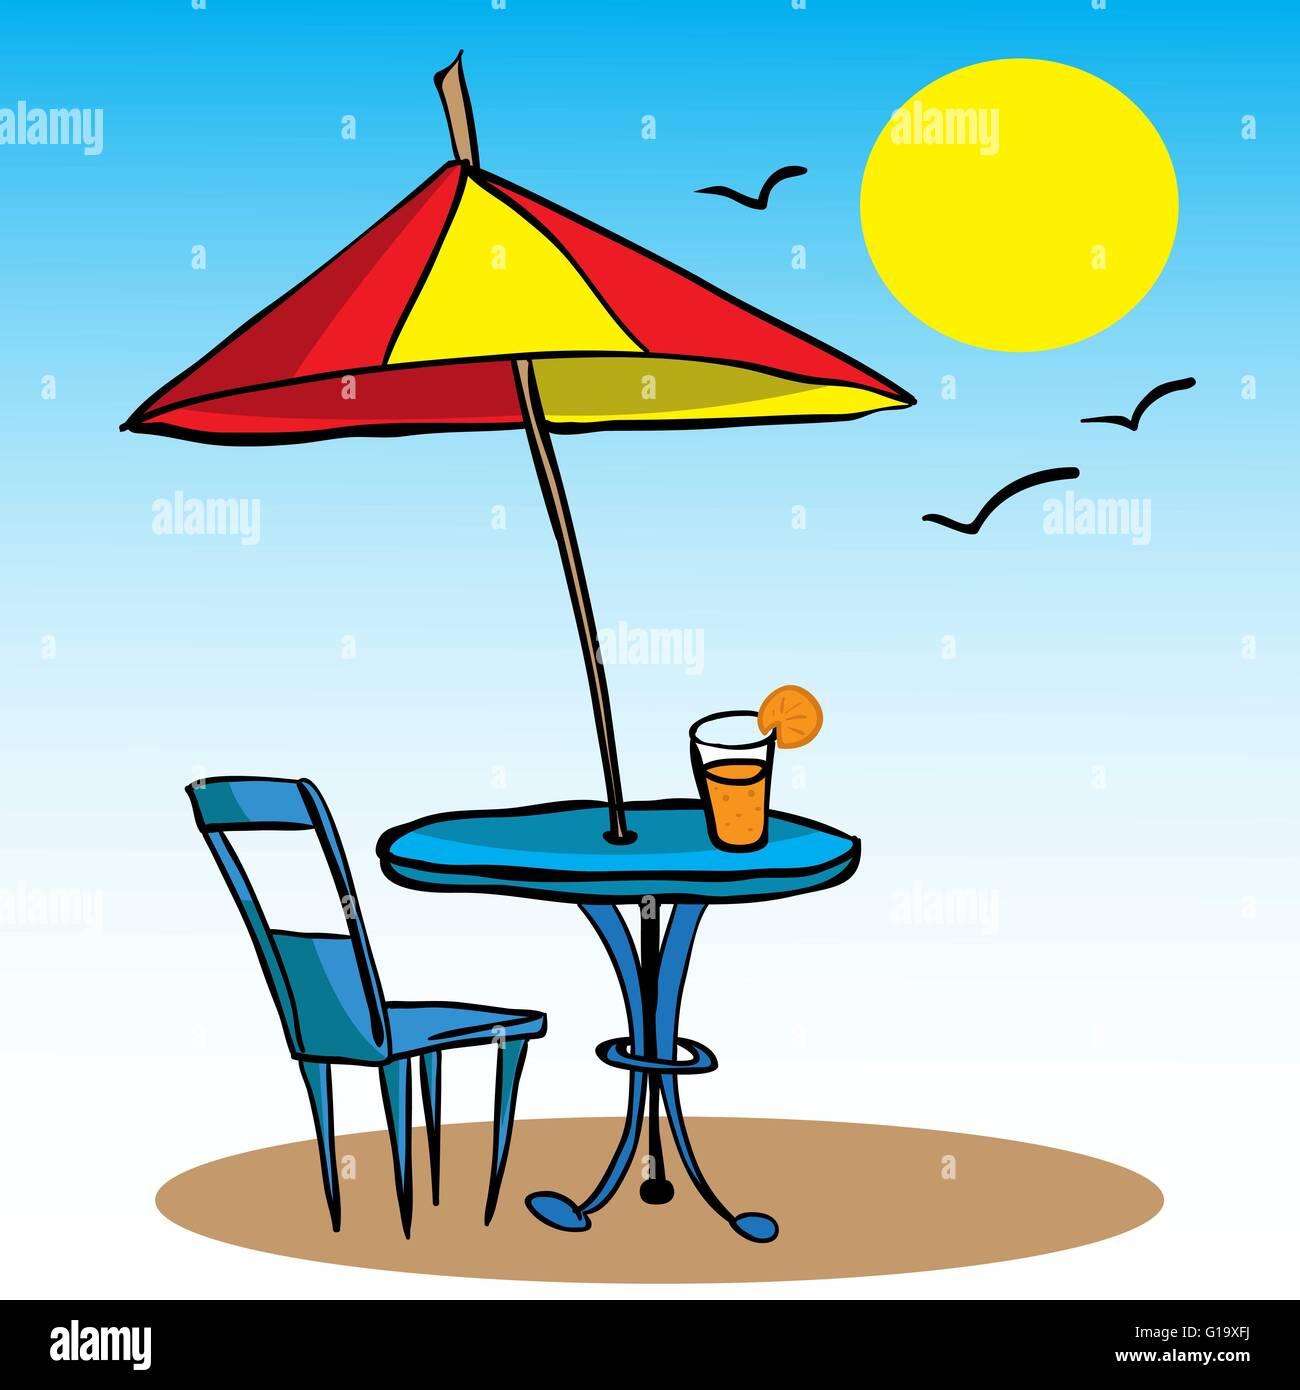 beach umbrella table chair and juice cartoon doodle stock vector rh alamy com cartoon picture of beach umbrella beach umbrella cartoon drawing